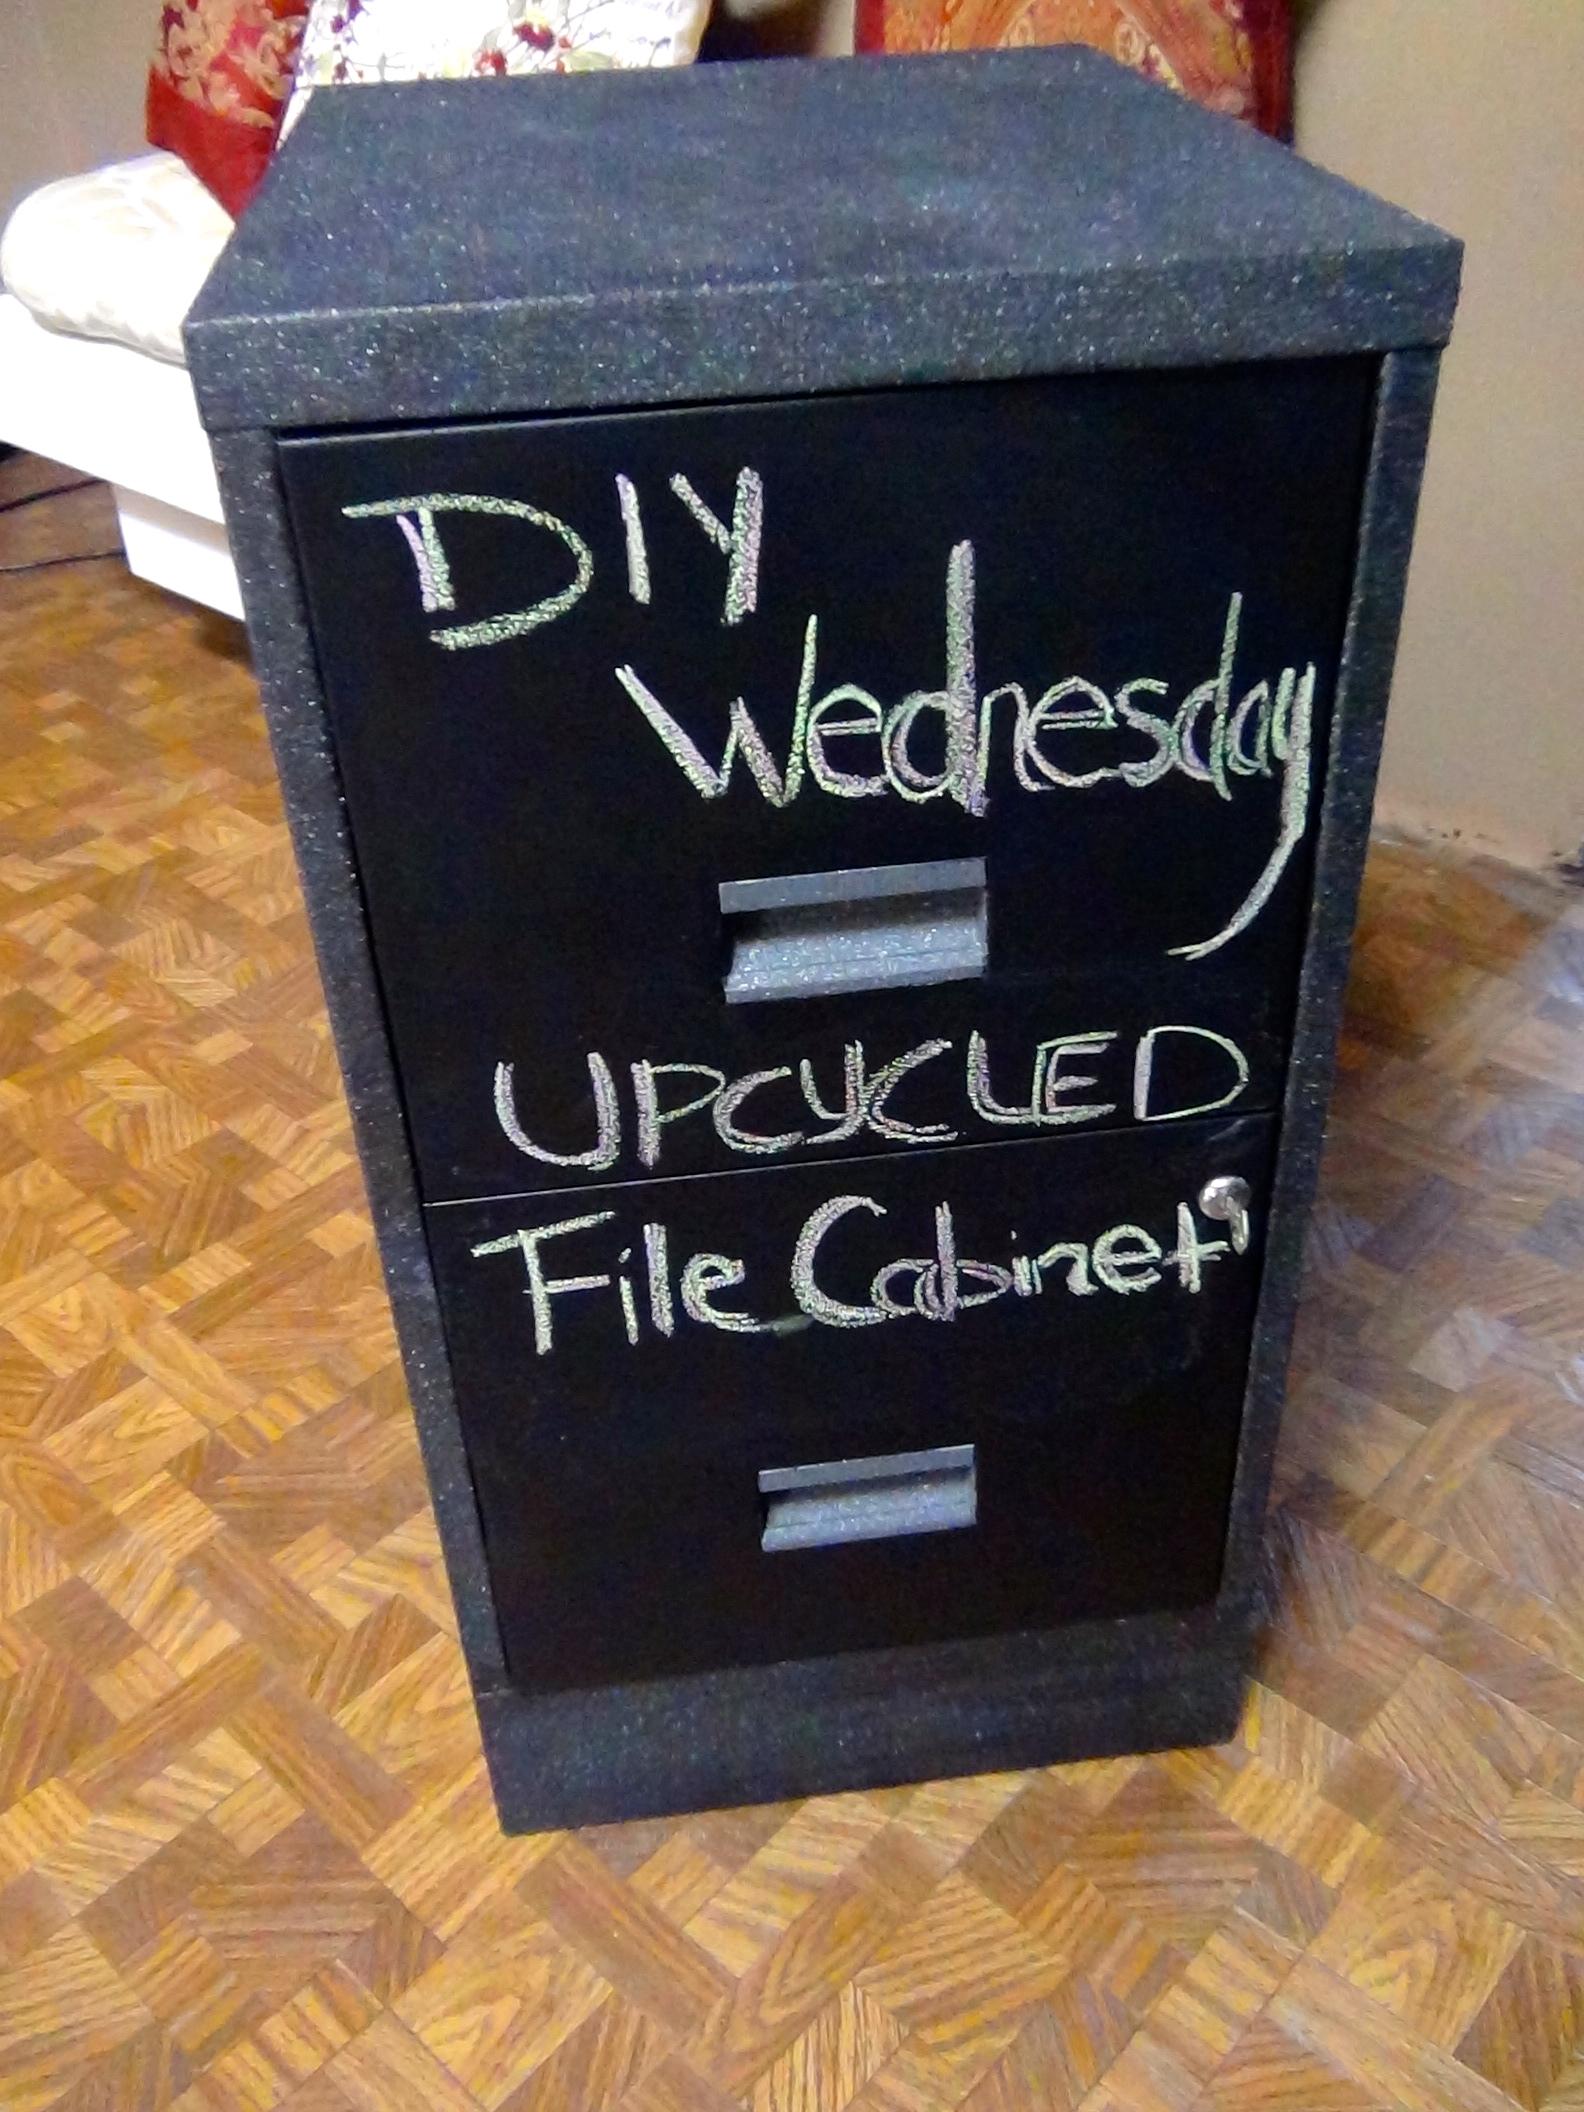 HowTo DIY Chalkboard Paint Metal File CabinetsTax Season